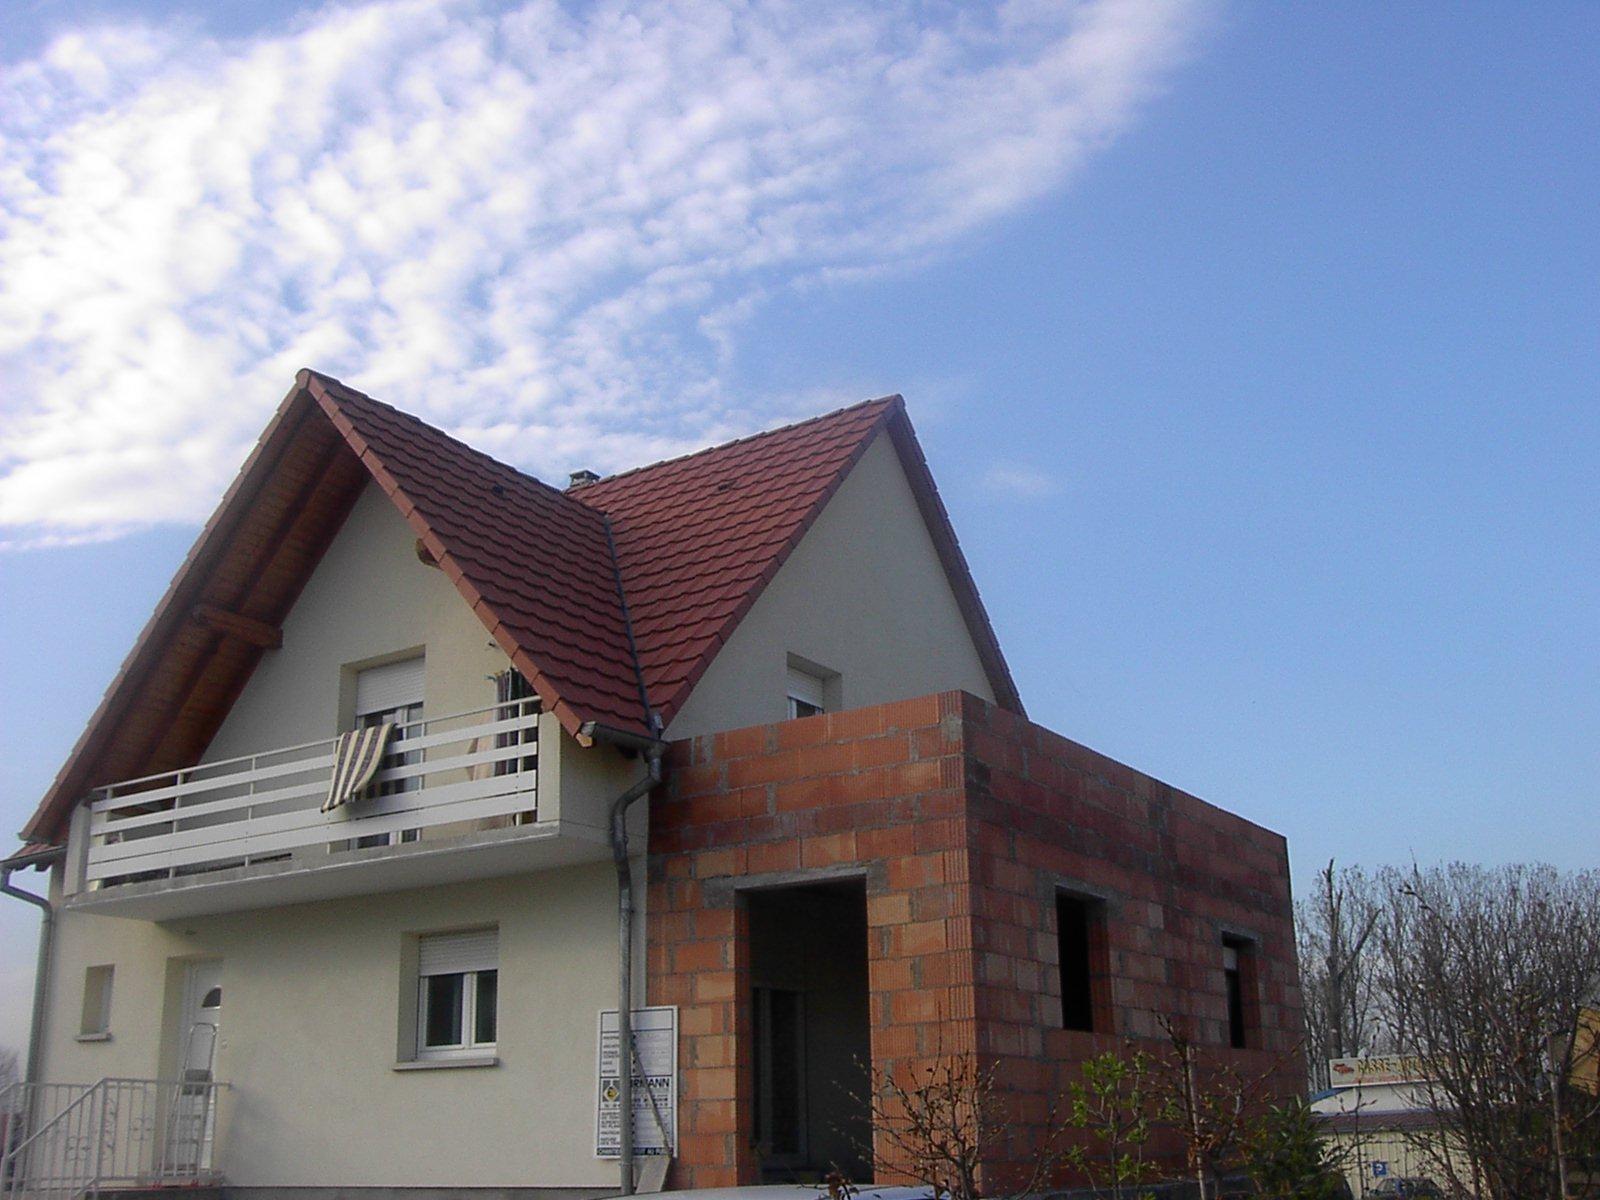 charpente b ton maison individuelle ventana blog. Black Bedroom Furniture Sets. Home Design Ideas